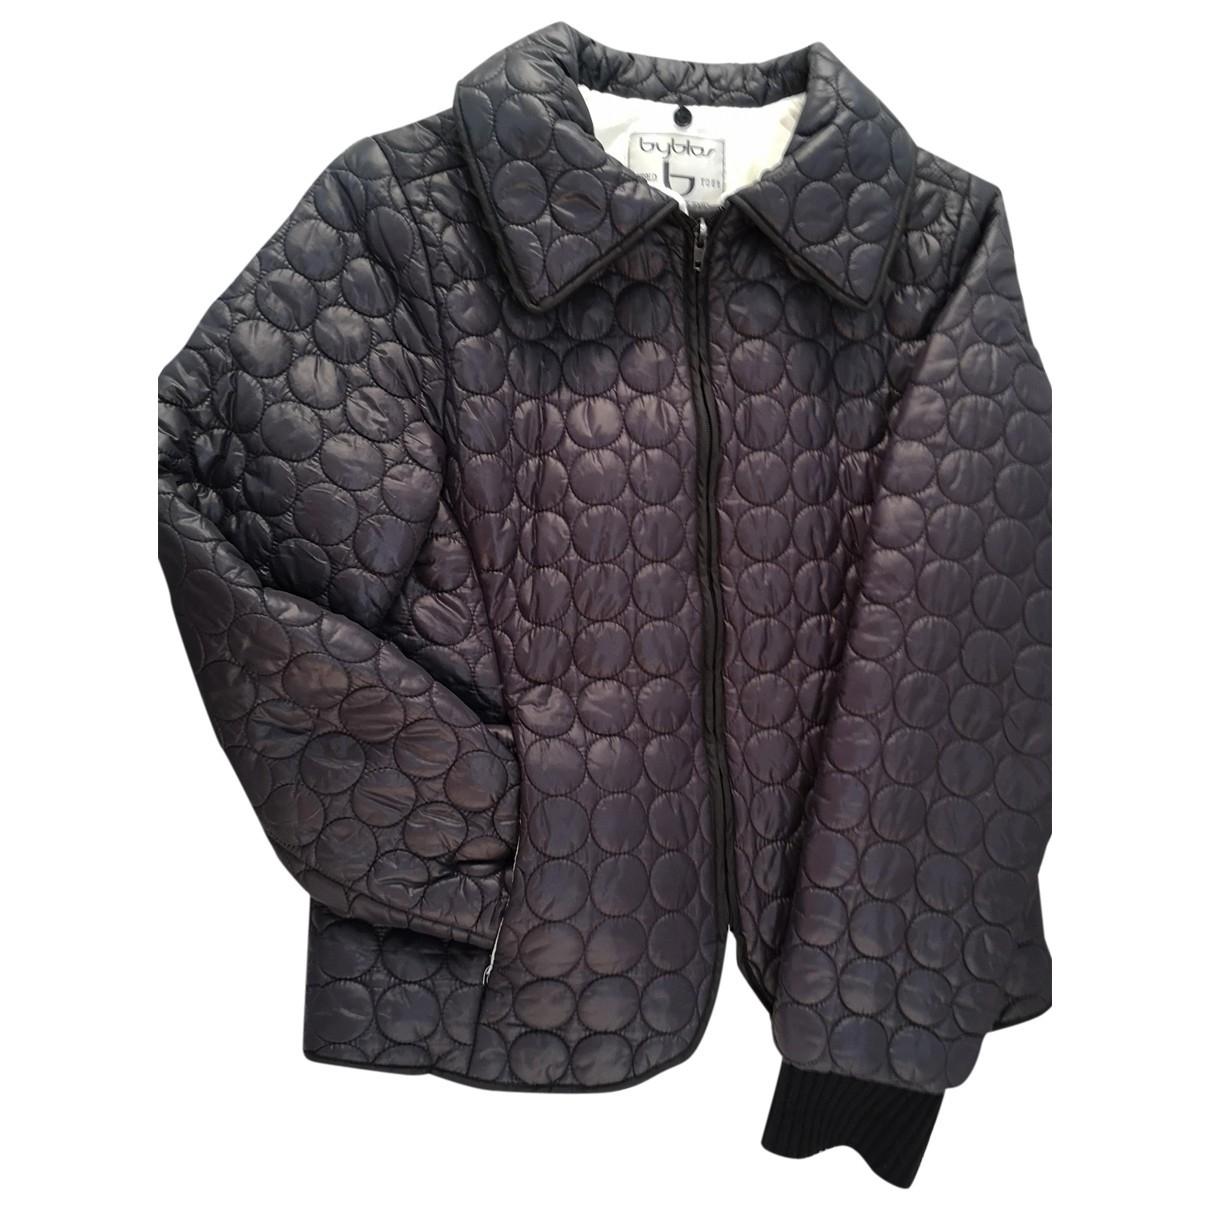 Byblos \N Navy jacket for Women S International